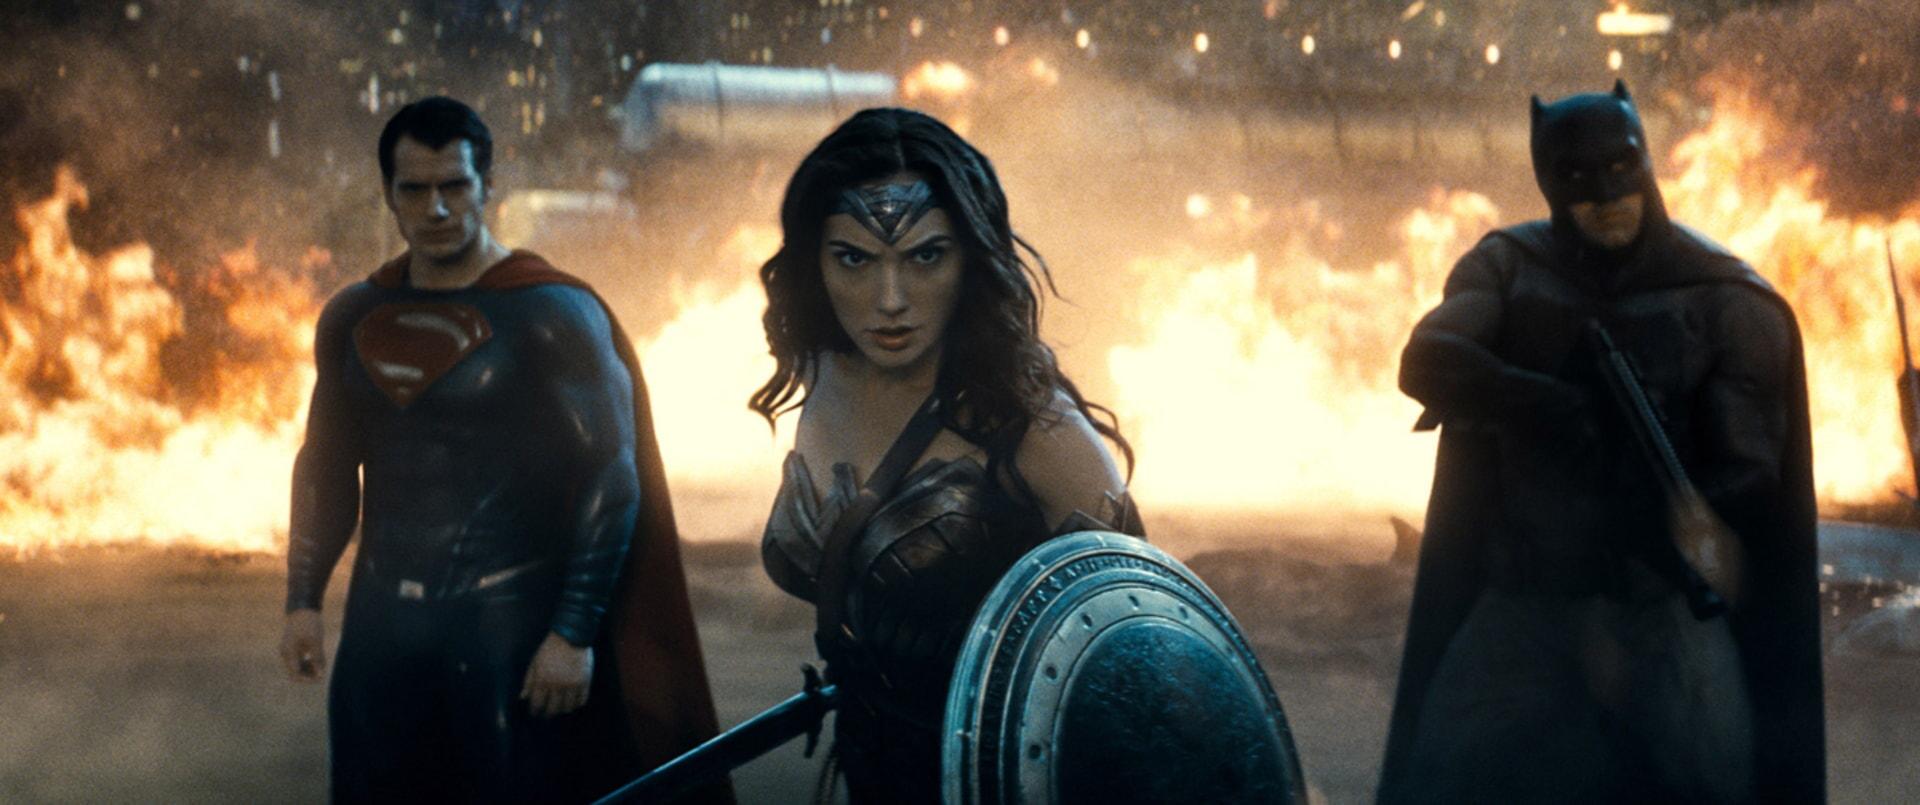 HENRY CAVILL as Superman, GAL GADOT as Wonder Woman and BEN AFFLECK as Batman